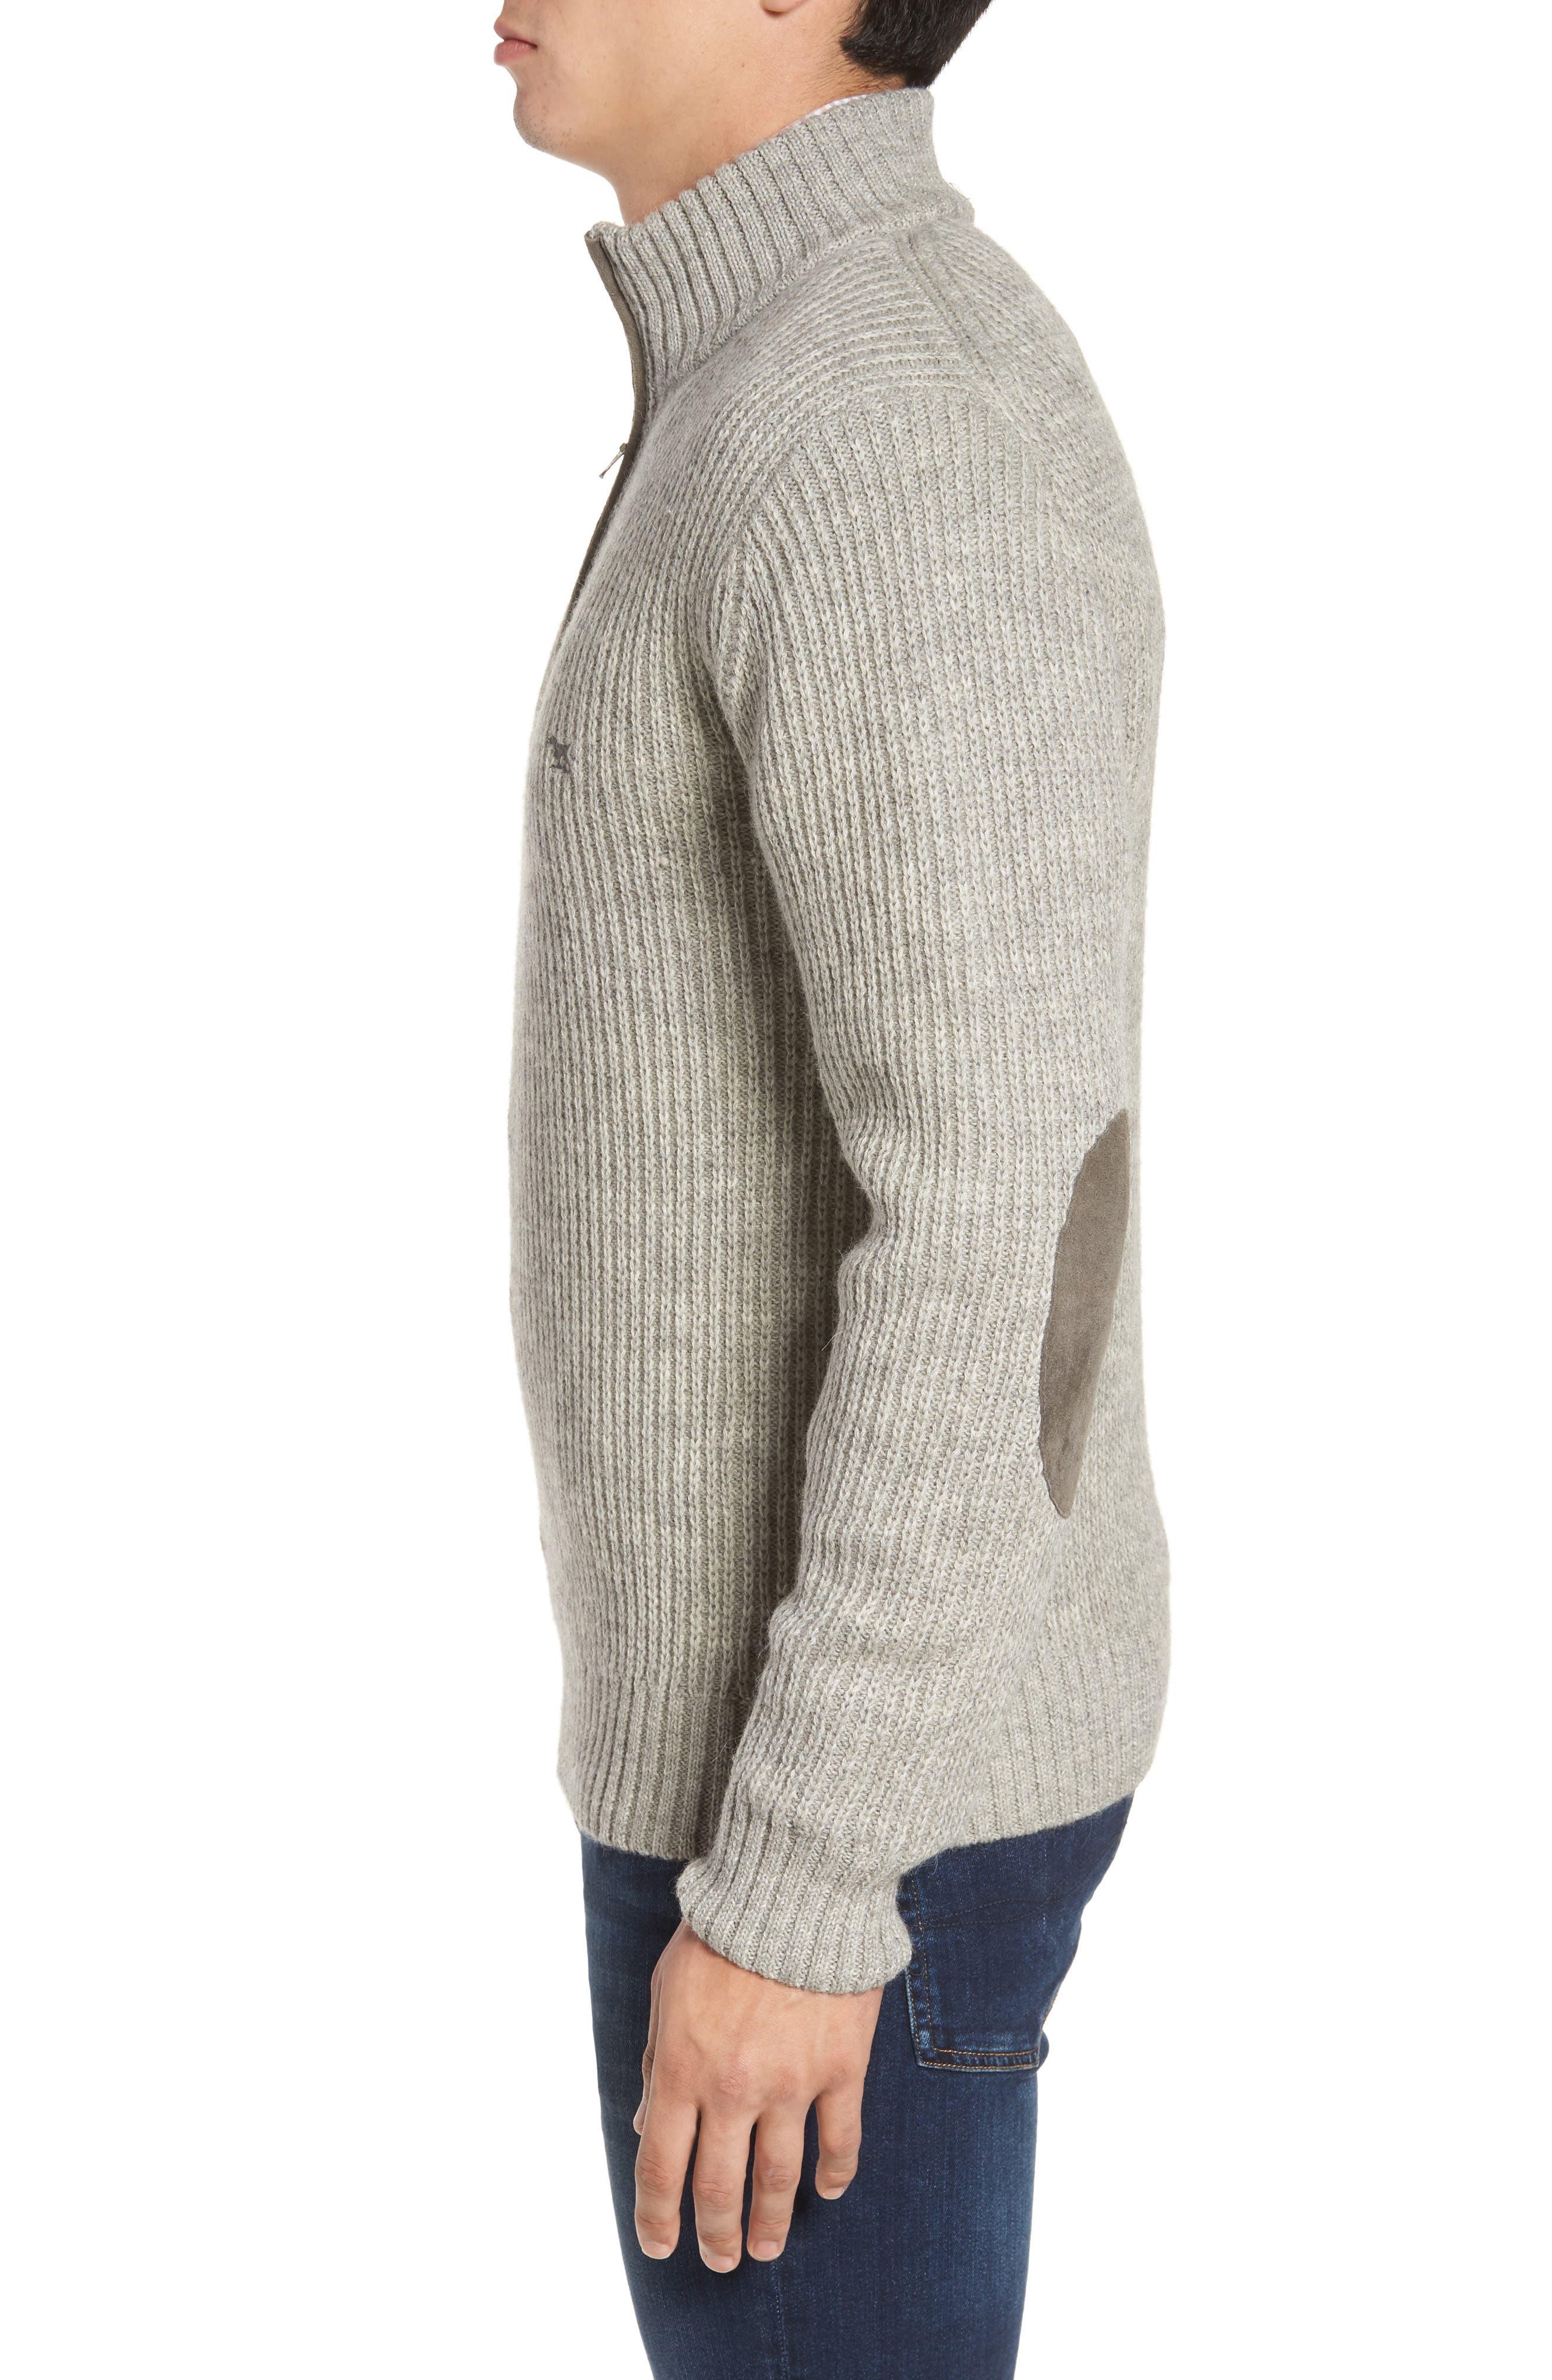 'Huka Lodge' Merino Wool Blend Quarter Zip Sweater,                             Alternate thumbnail 3, color,                             268